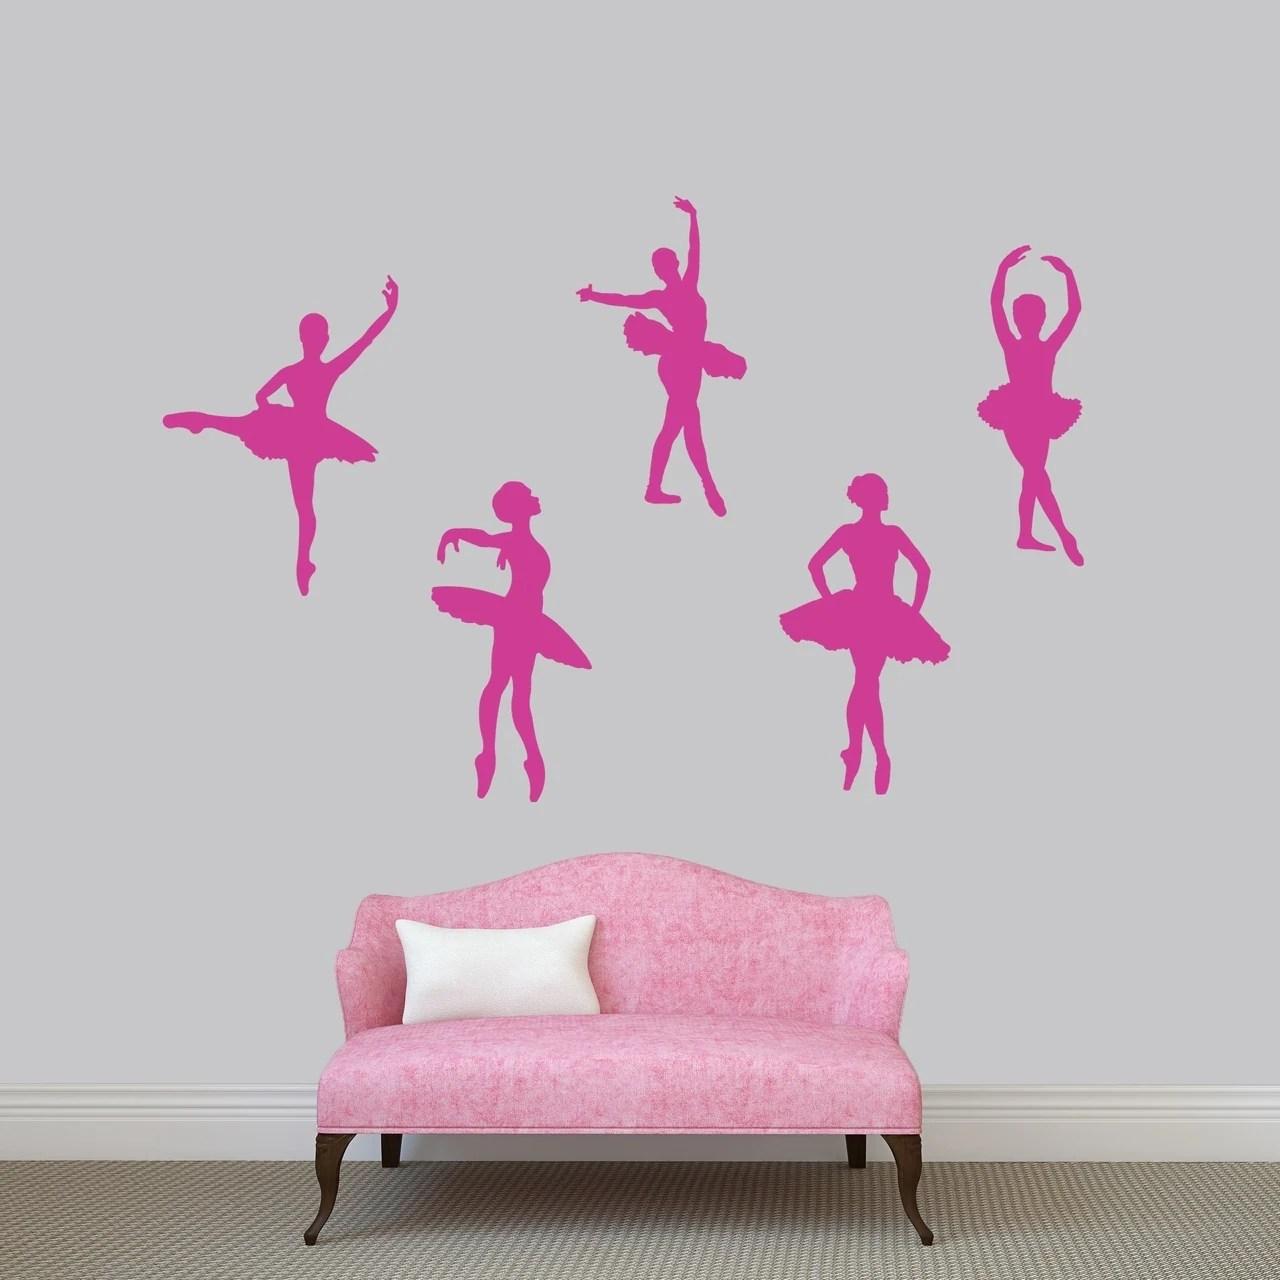 Set of Ballerinas Wall Decal Pack - MEDIUM